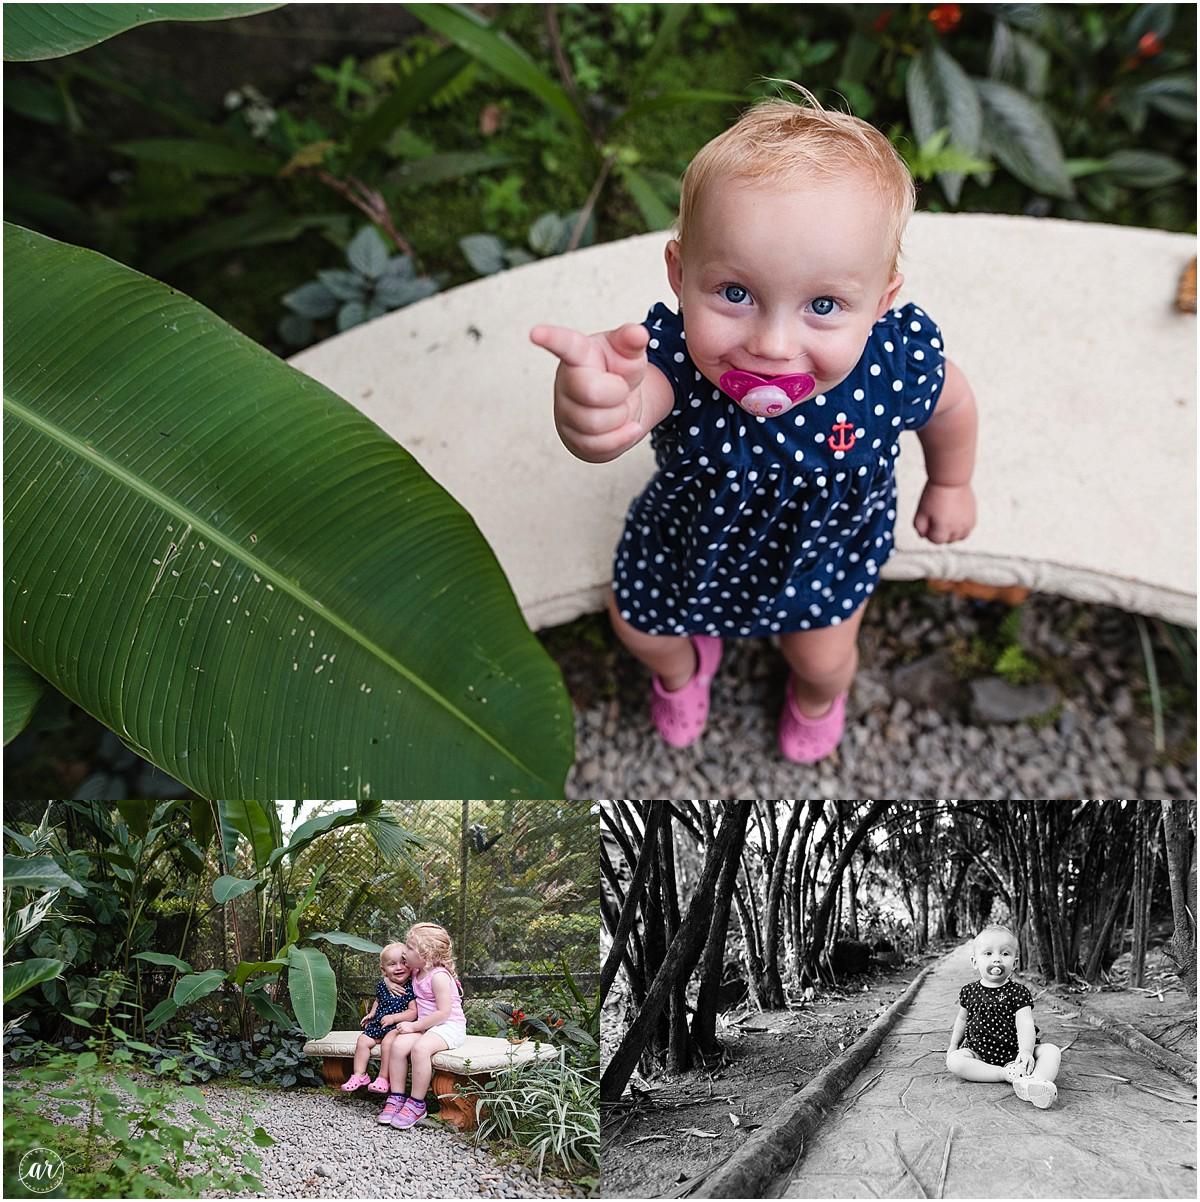 Ashley_Rogers_Photography_South_Florida_Photographer_Orlando_Photographer_Costa_Rica_Photographer_0506.jpg